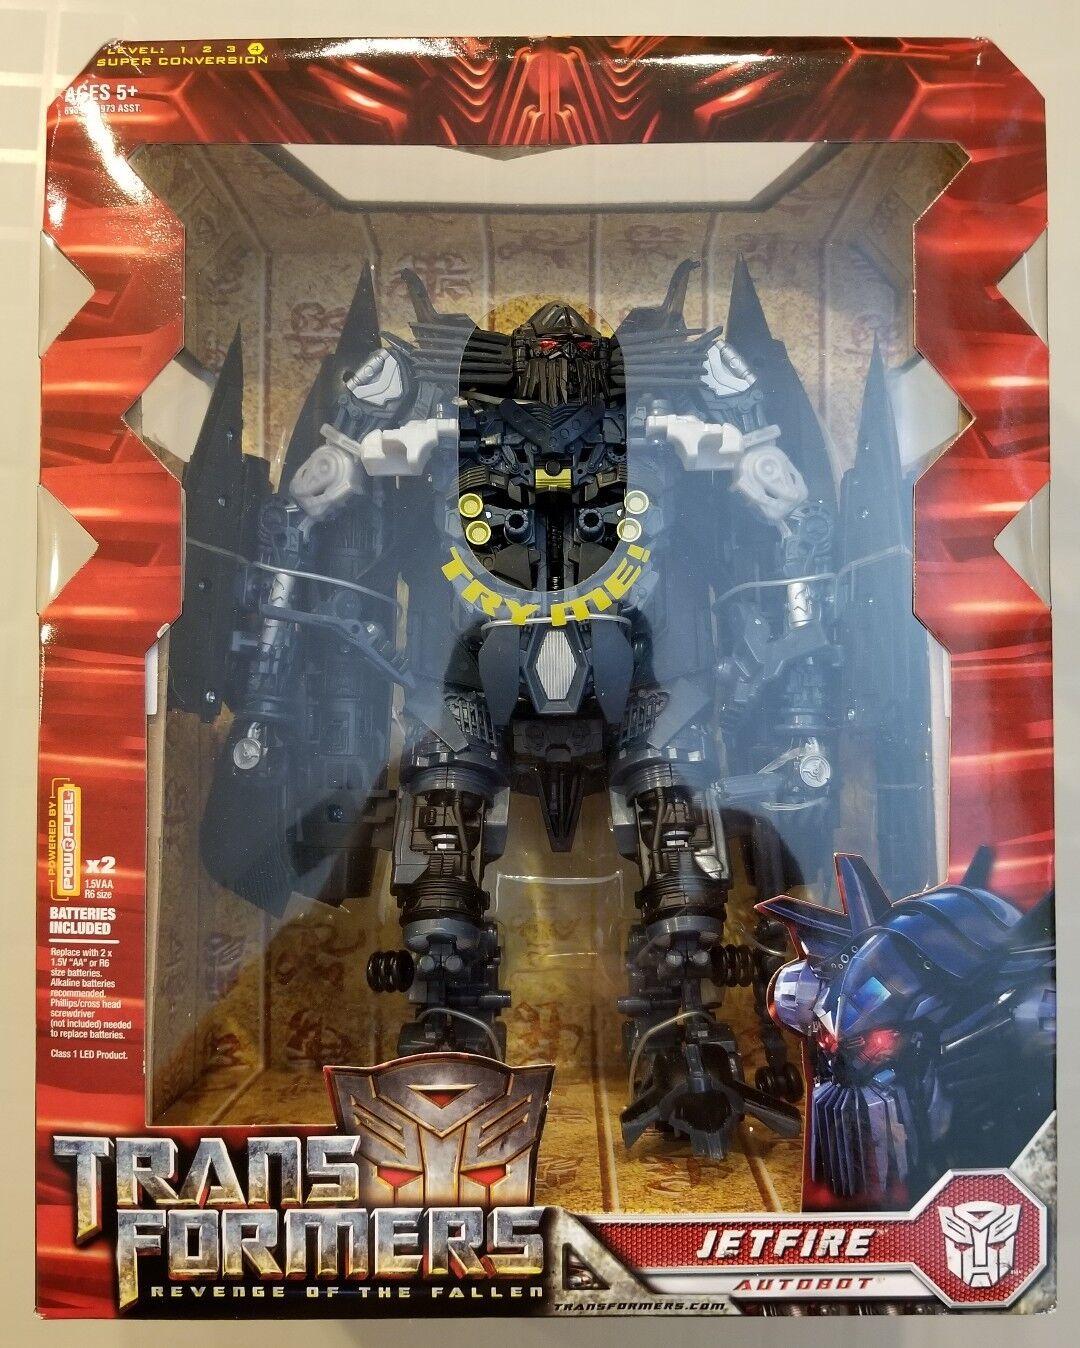 2009 HASBRO Transformers redF Revenge Of The Fallen AUTOBOT JETFIRE Leader NEW